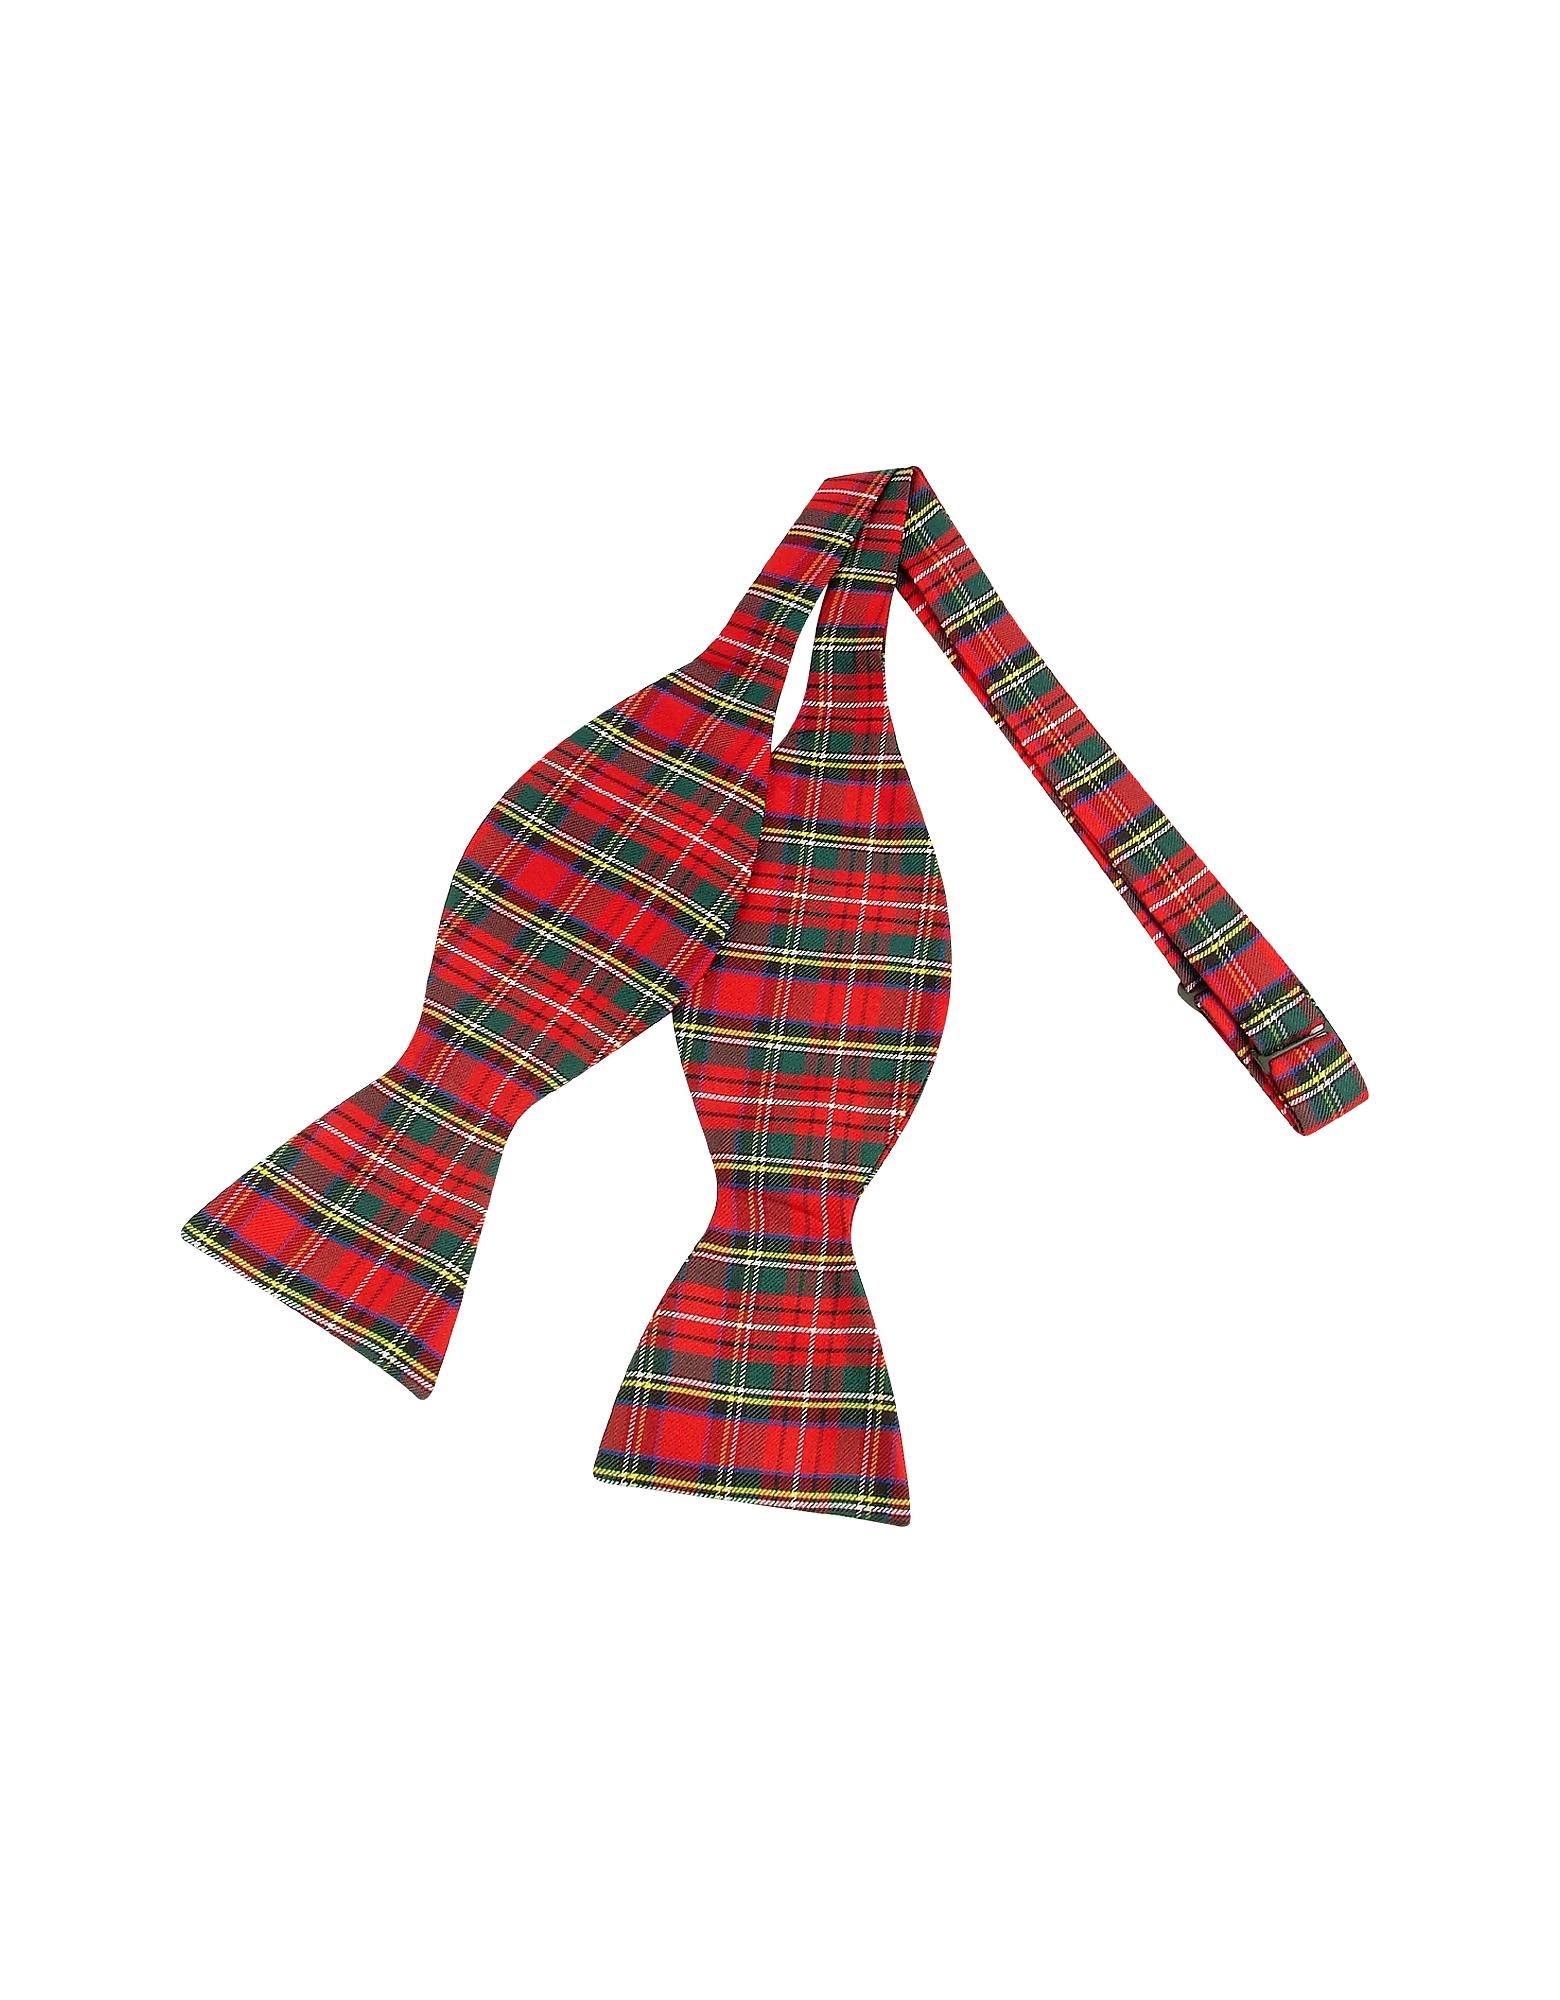 Red & Green Plaid Printed Silk Self-tie Bowtie